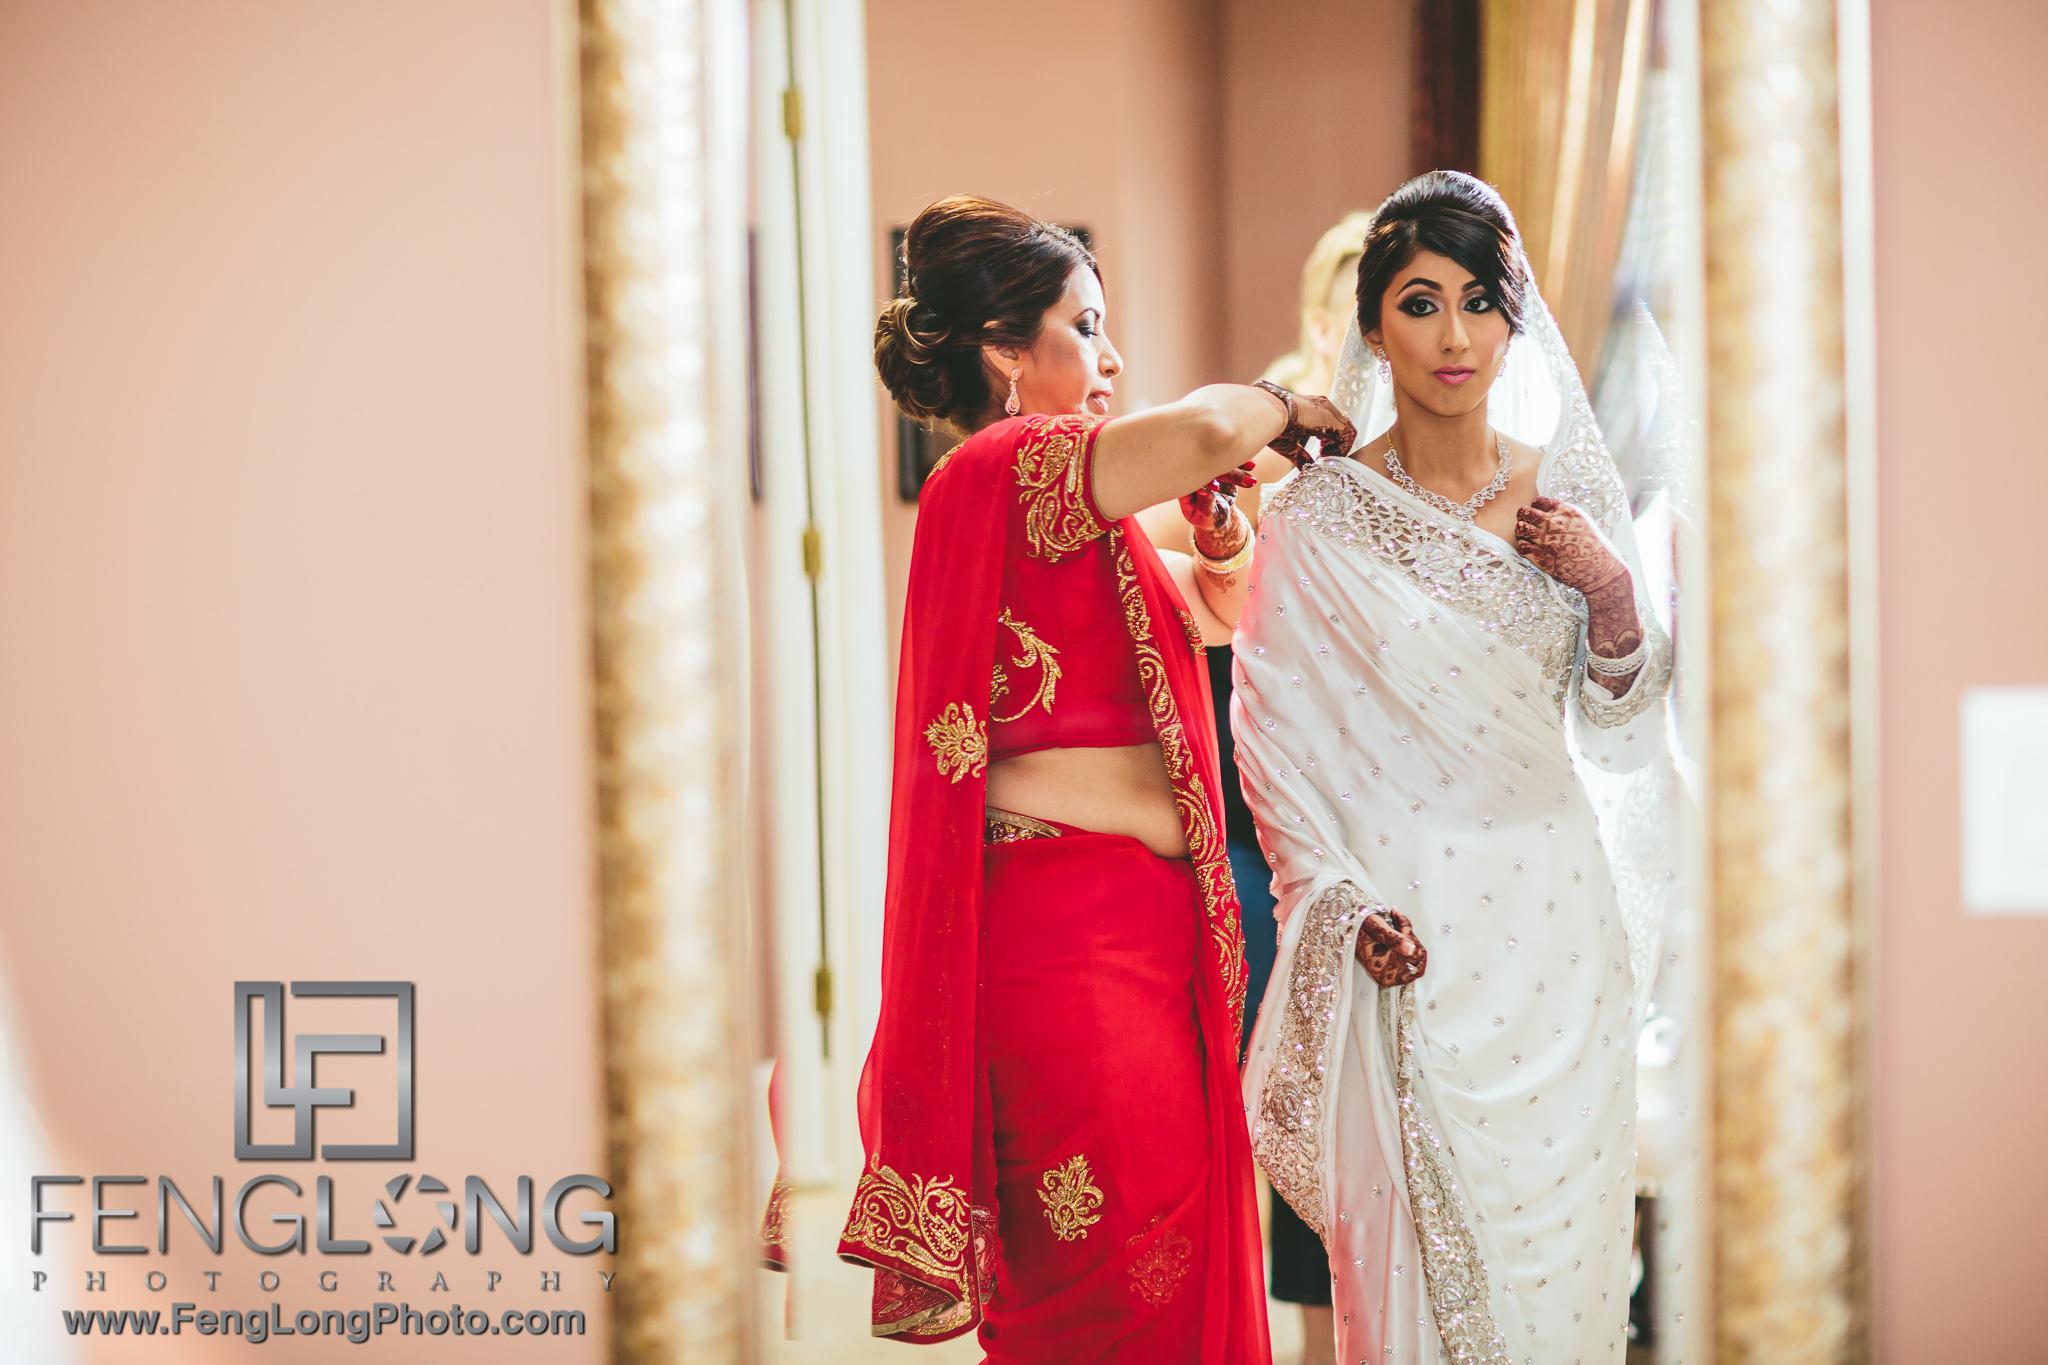 atlanta-indian-wedding-nikkah-reception-crowne-plaza-321435